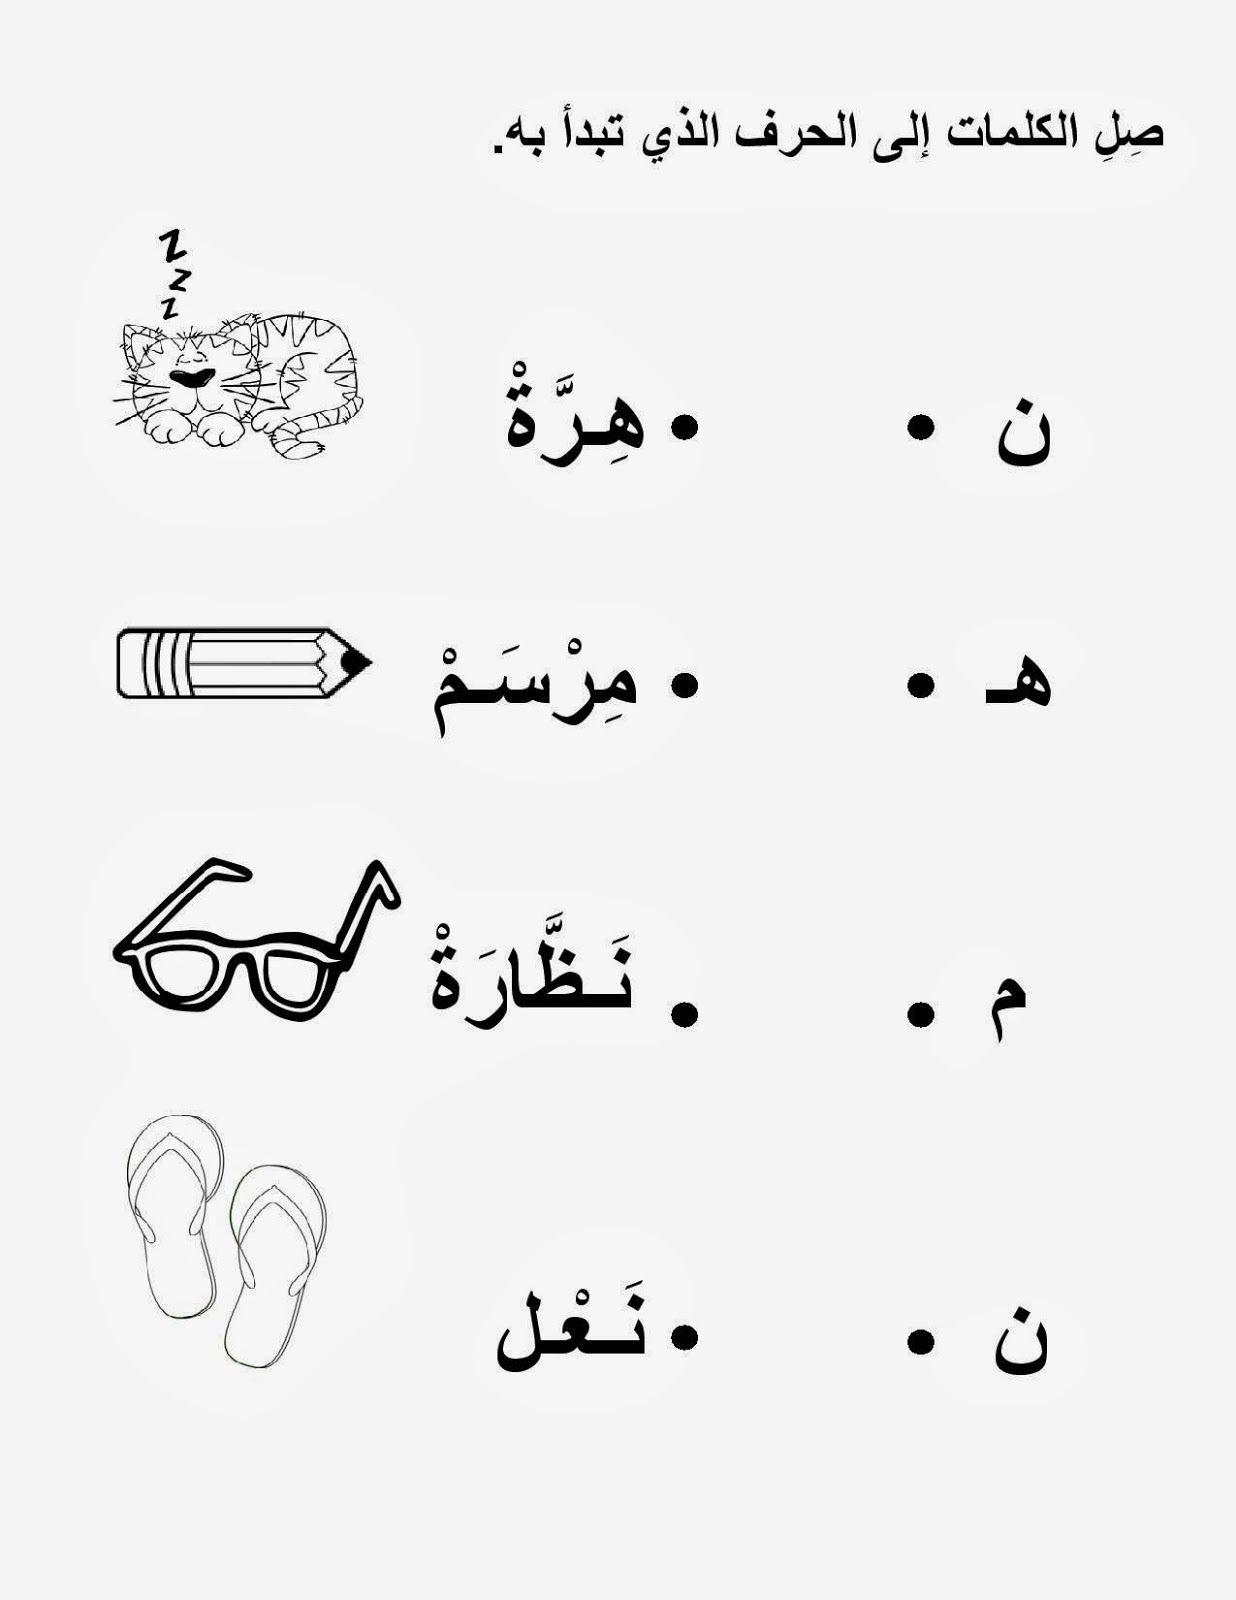 Arabic Worksheets For Kids 20 Nov With Images